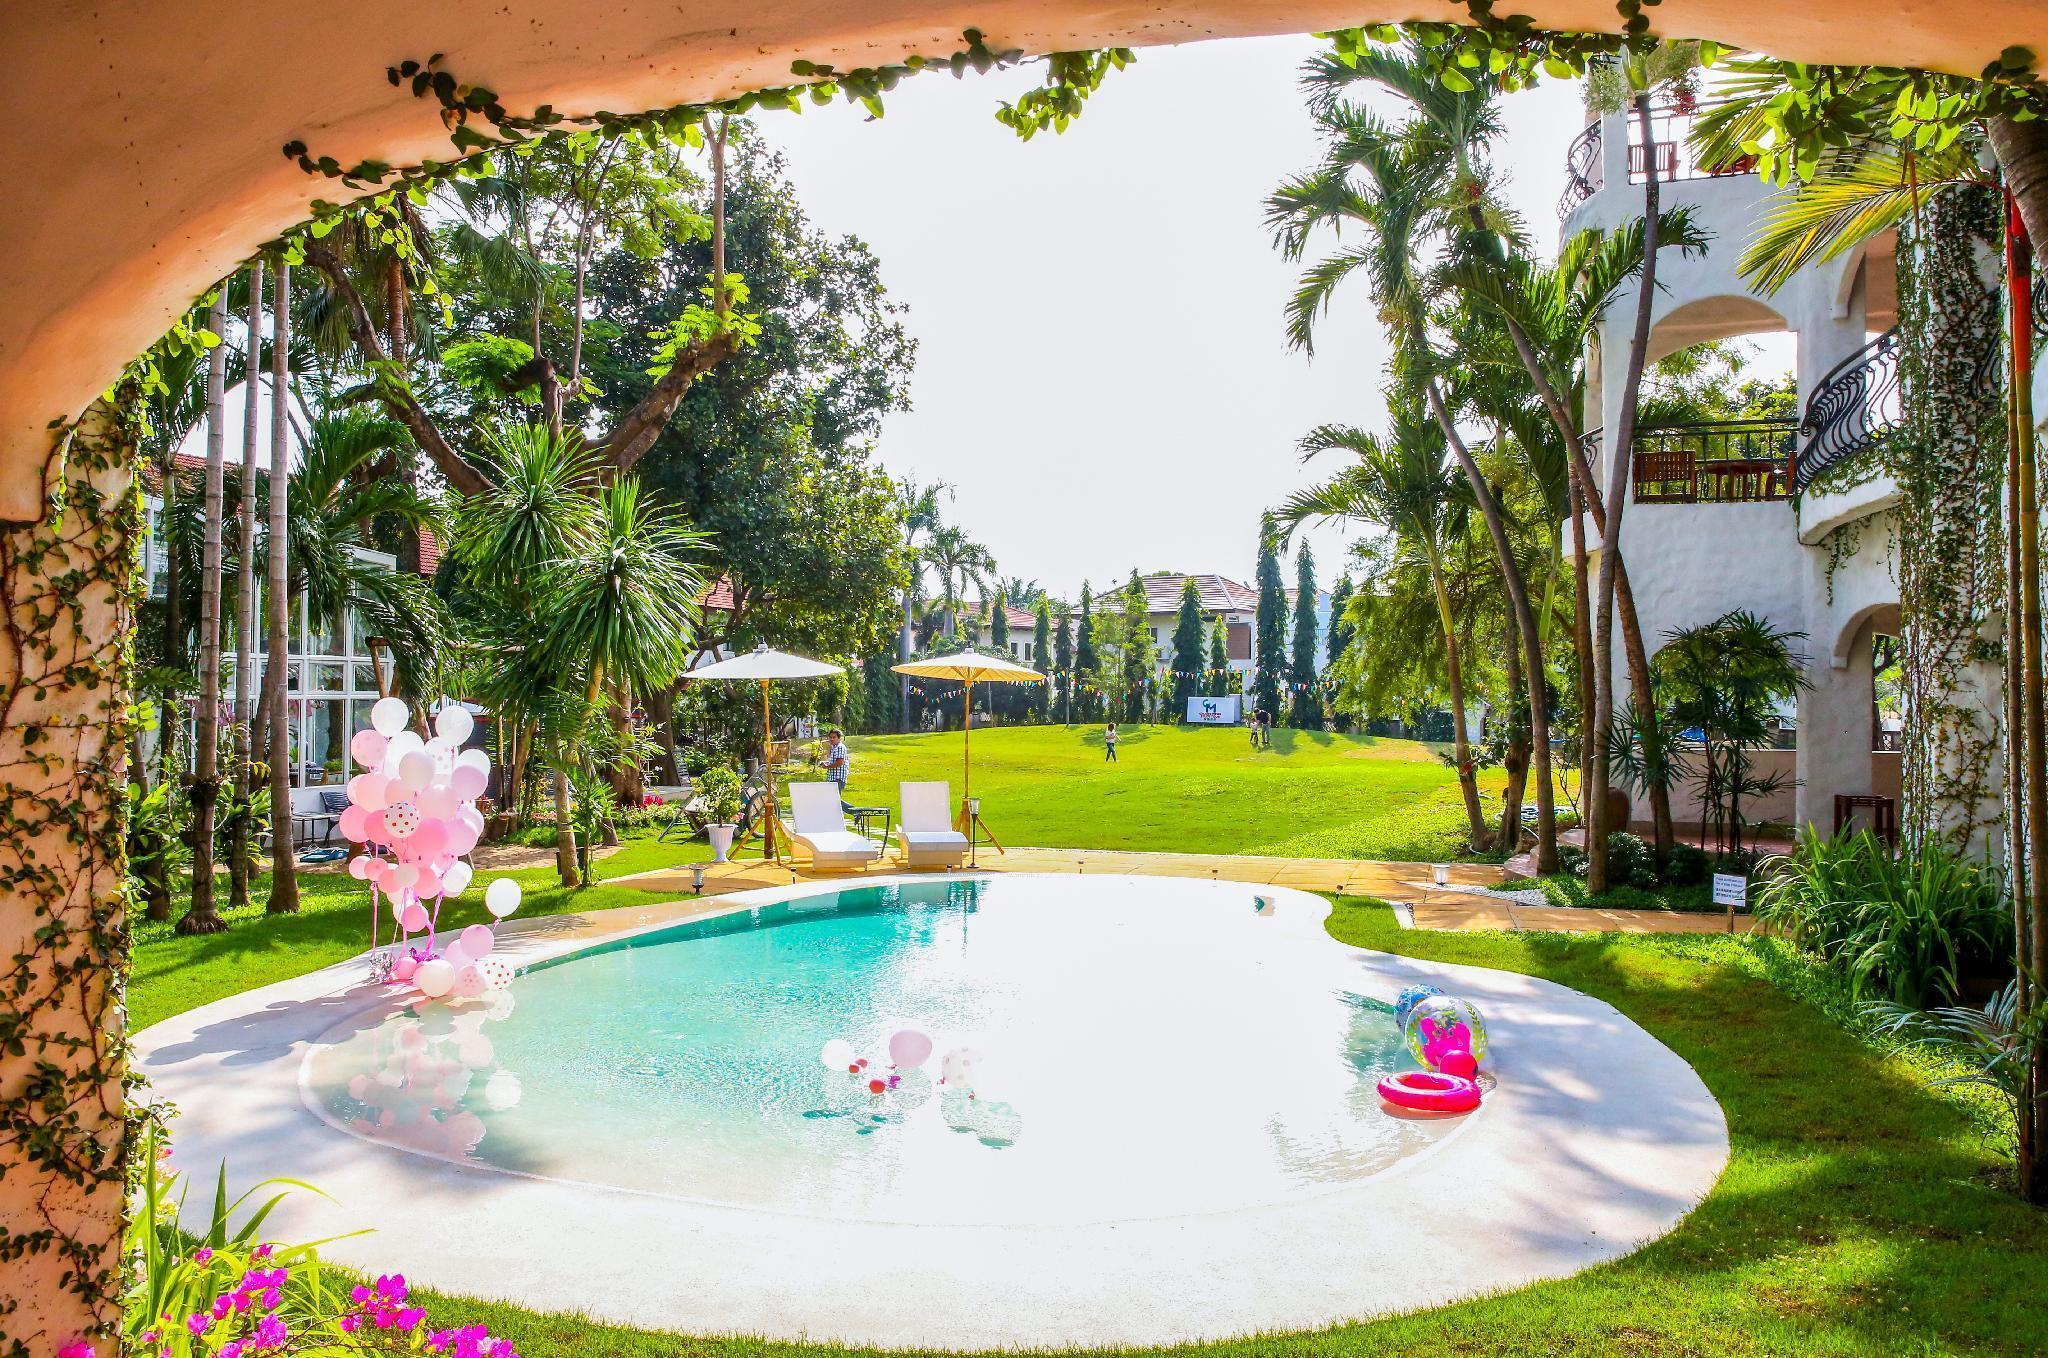 Palm Springs Hotel ปาล์ม สปริง โฮเต็ล